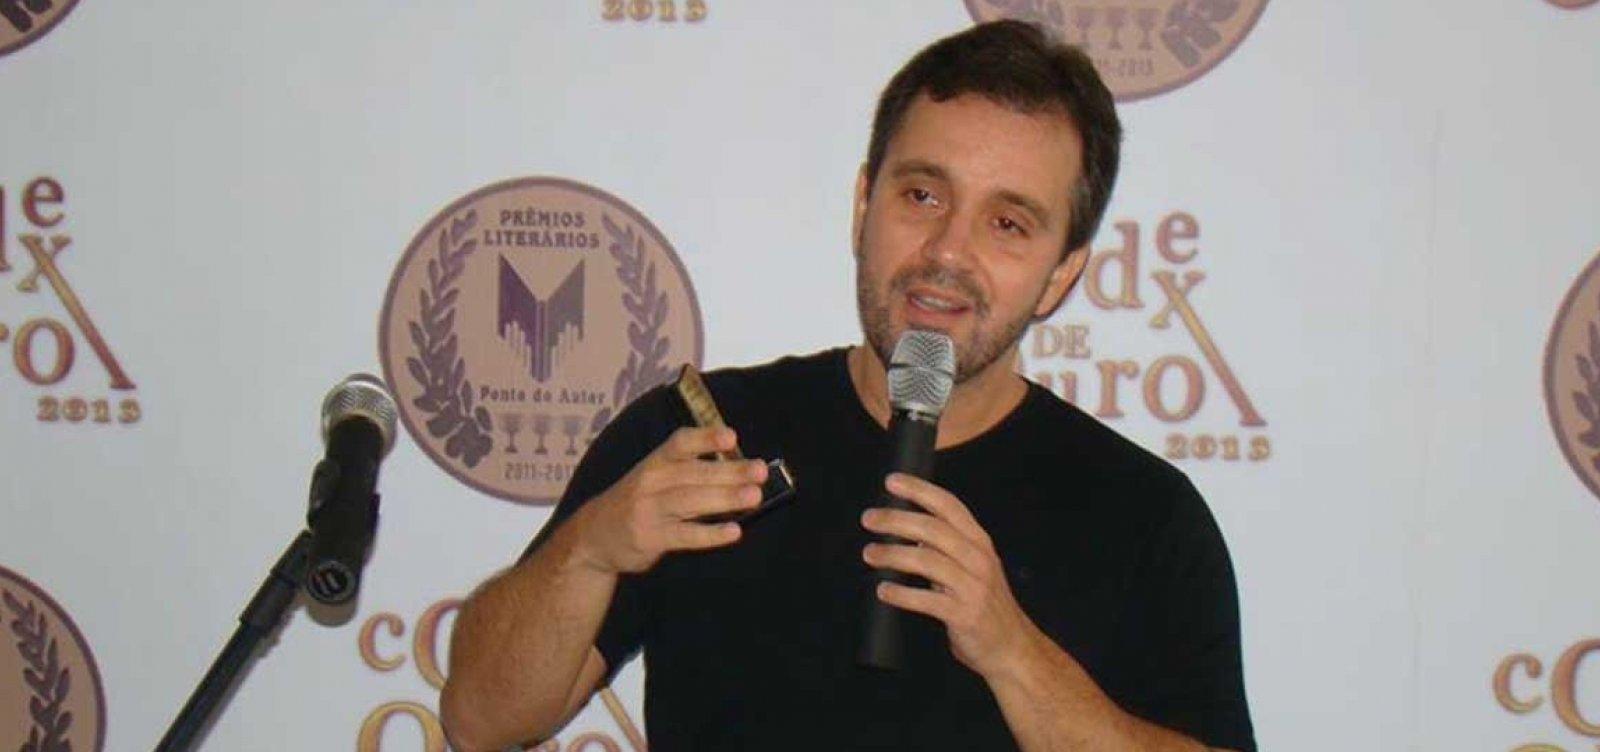 Bolsonaro aparece como 'herói' contra o petismo, analisa jornalista